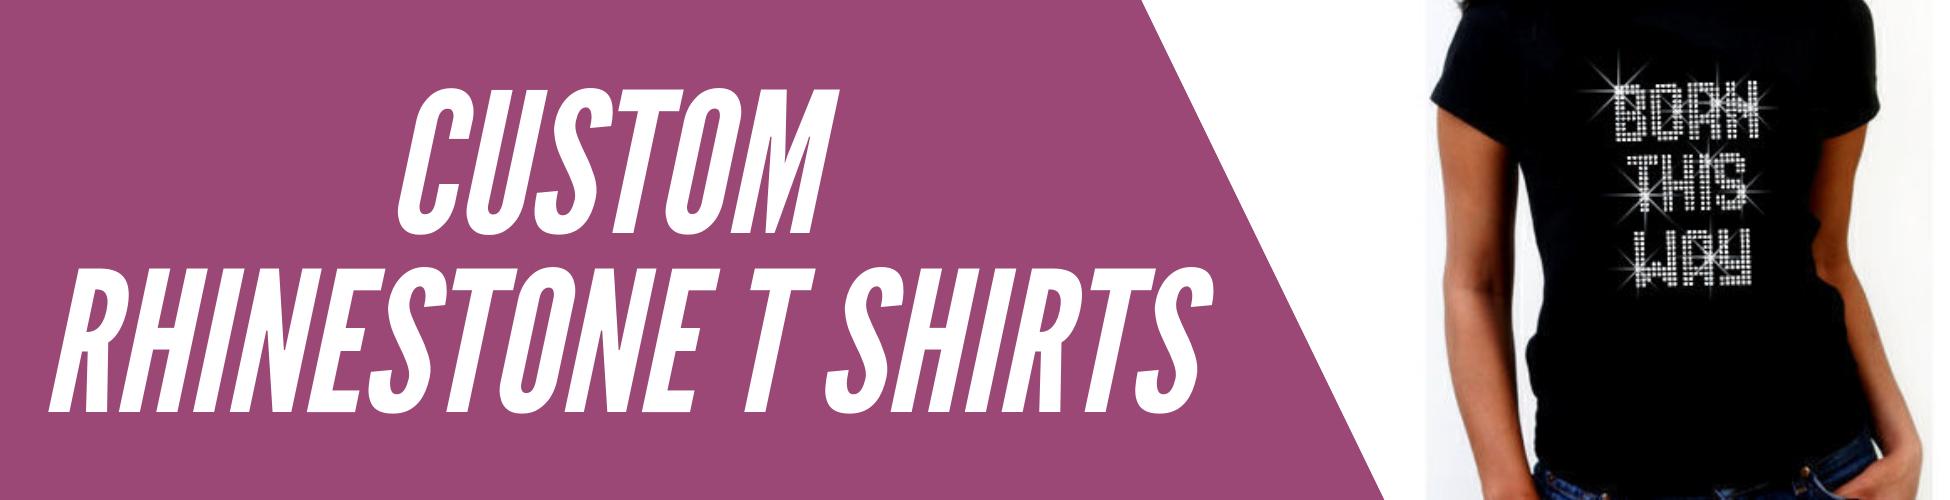 custom-rhinestone-t-shirts-banner-v3.png